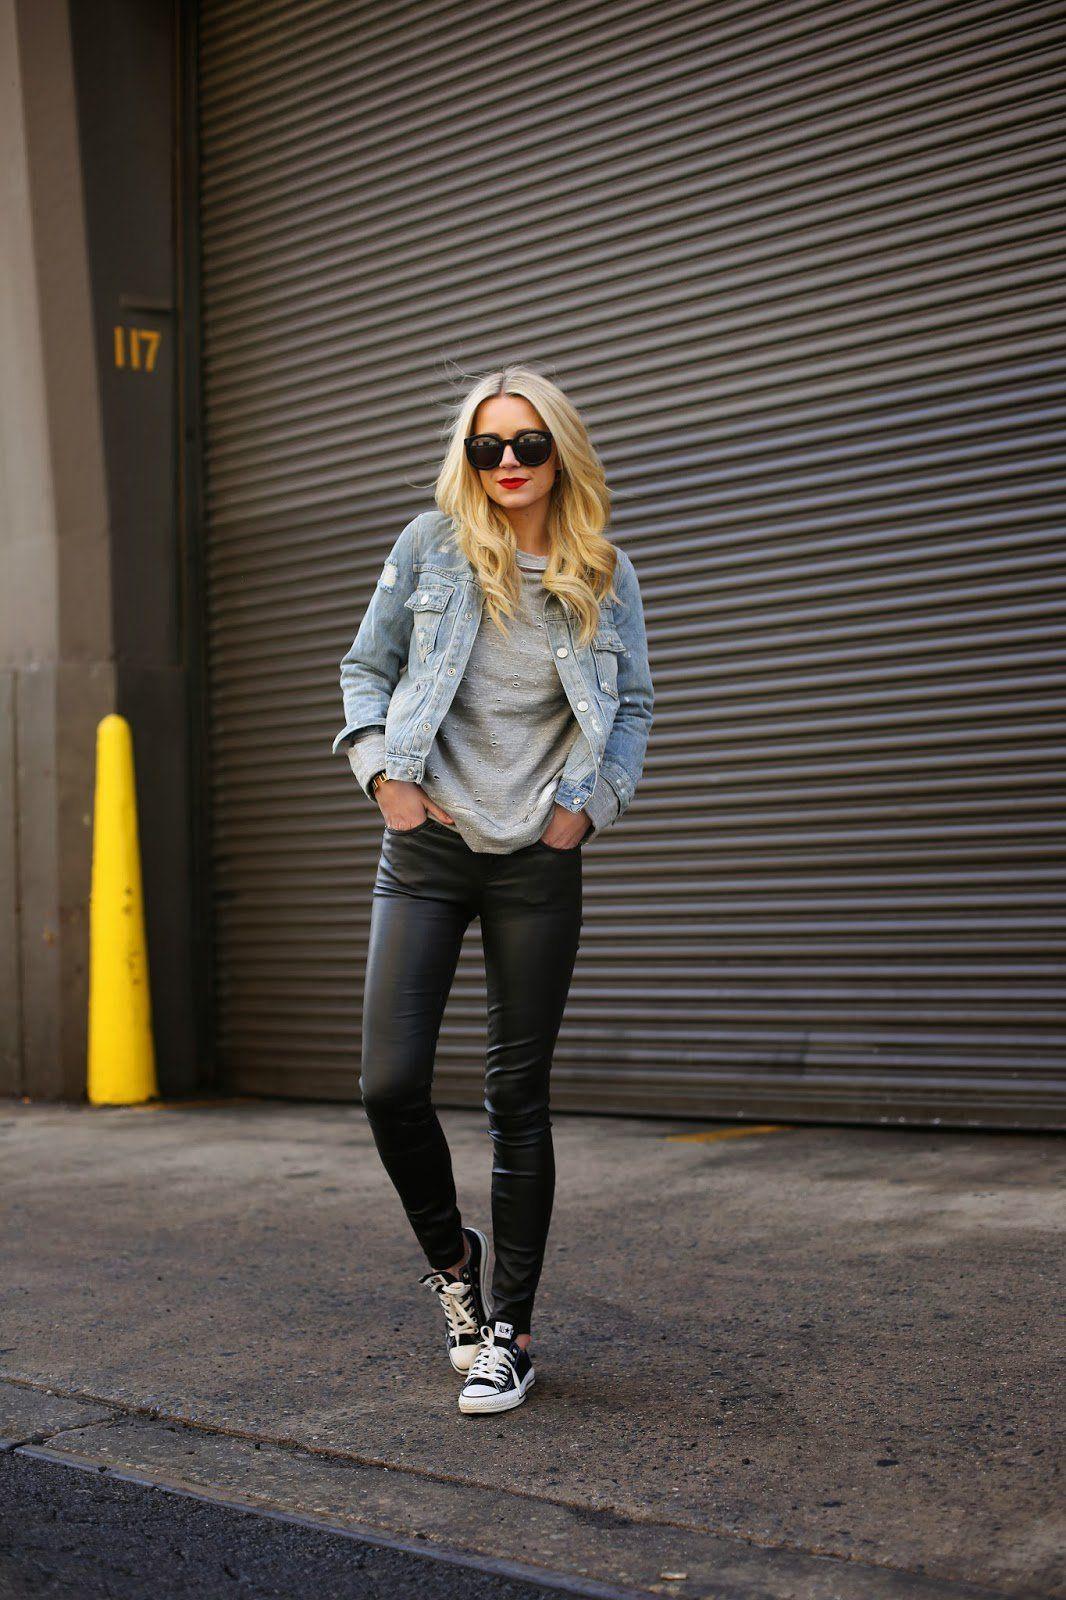 Rubia Negro Tenis Mujer Pantalon Fashion Y Con Converse dqZd6t